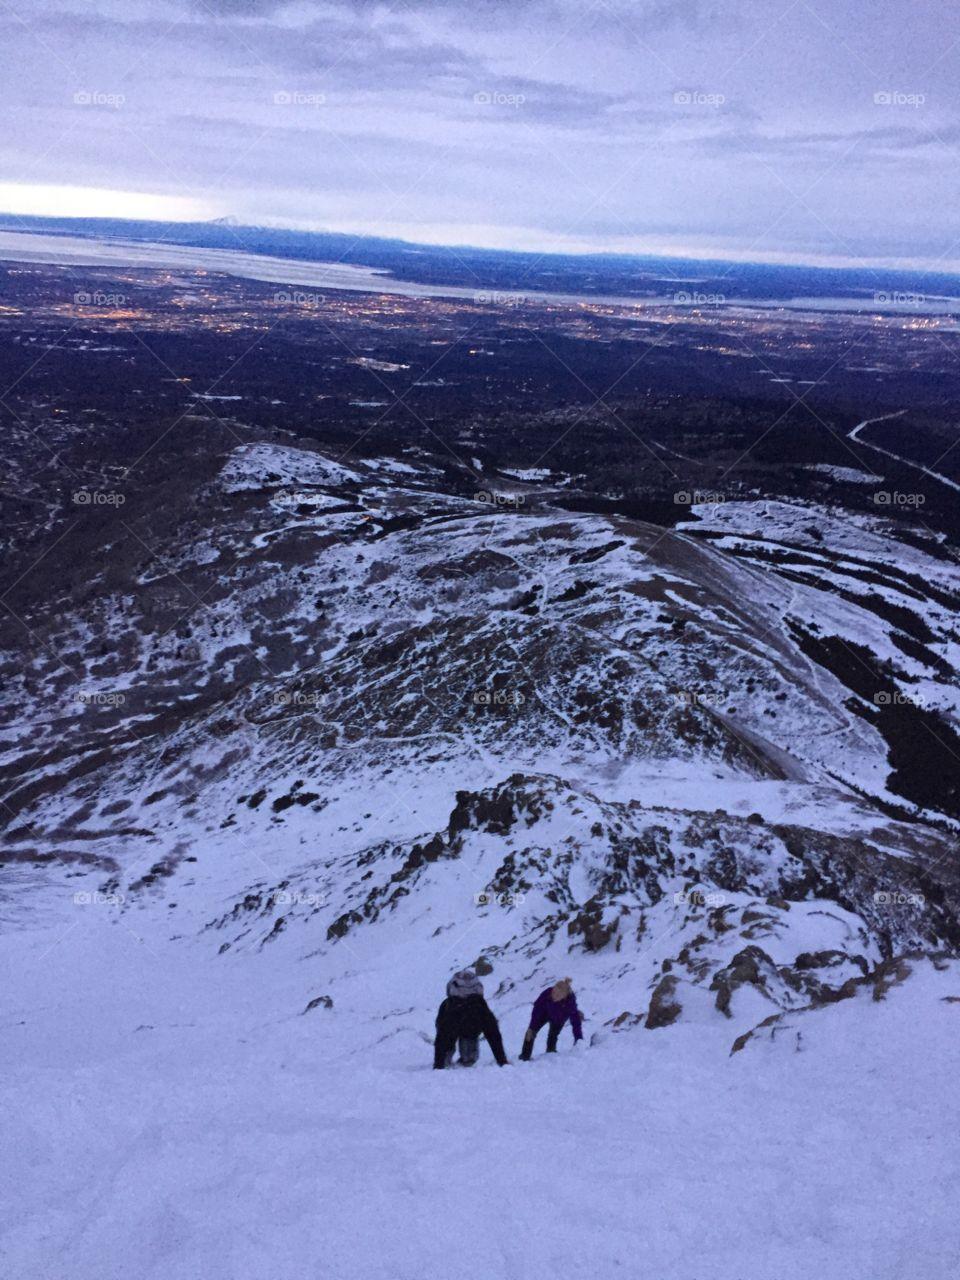 Mountain. Flatop mountain in Alaska